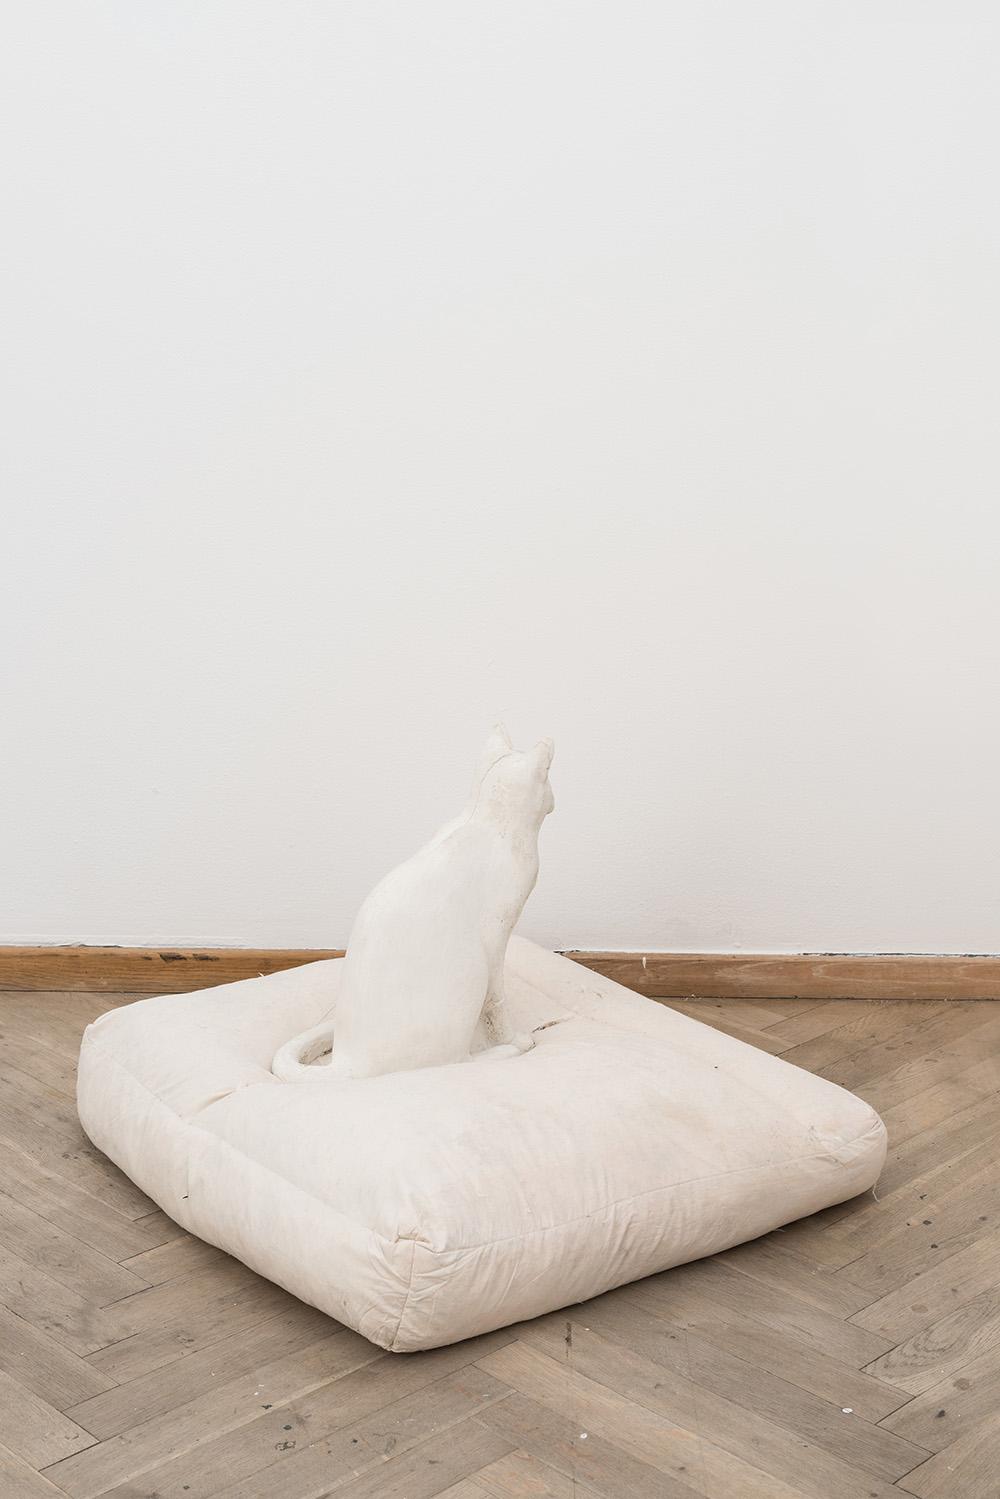 Afgang 2018, Sara Sjölin, 'Rika djur', 2018. Detail, Kunsthal Charlottenborg, 2018. Photo: David Stjernholm.